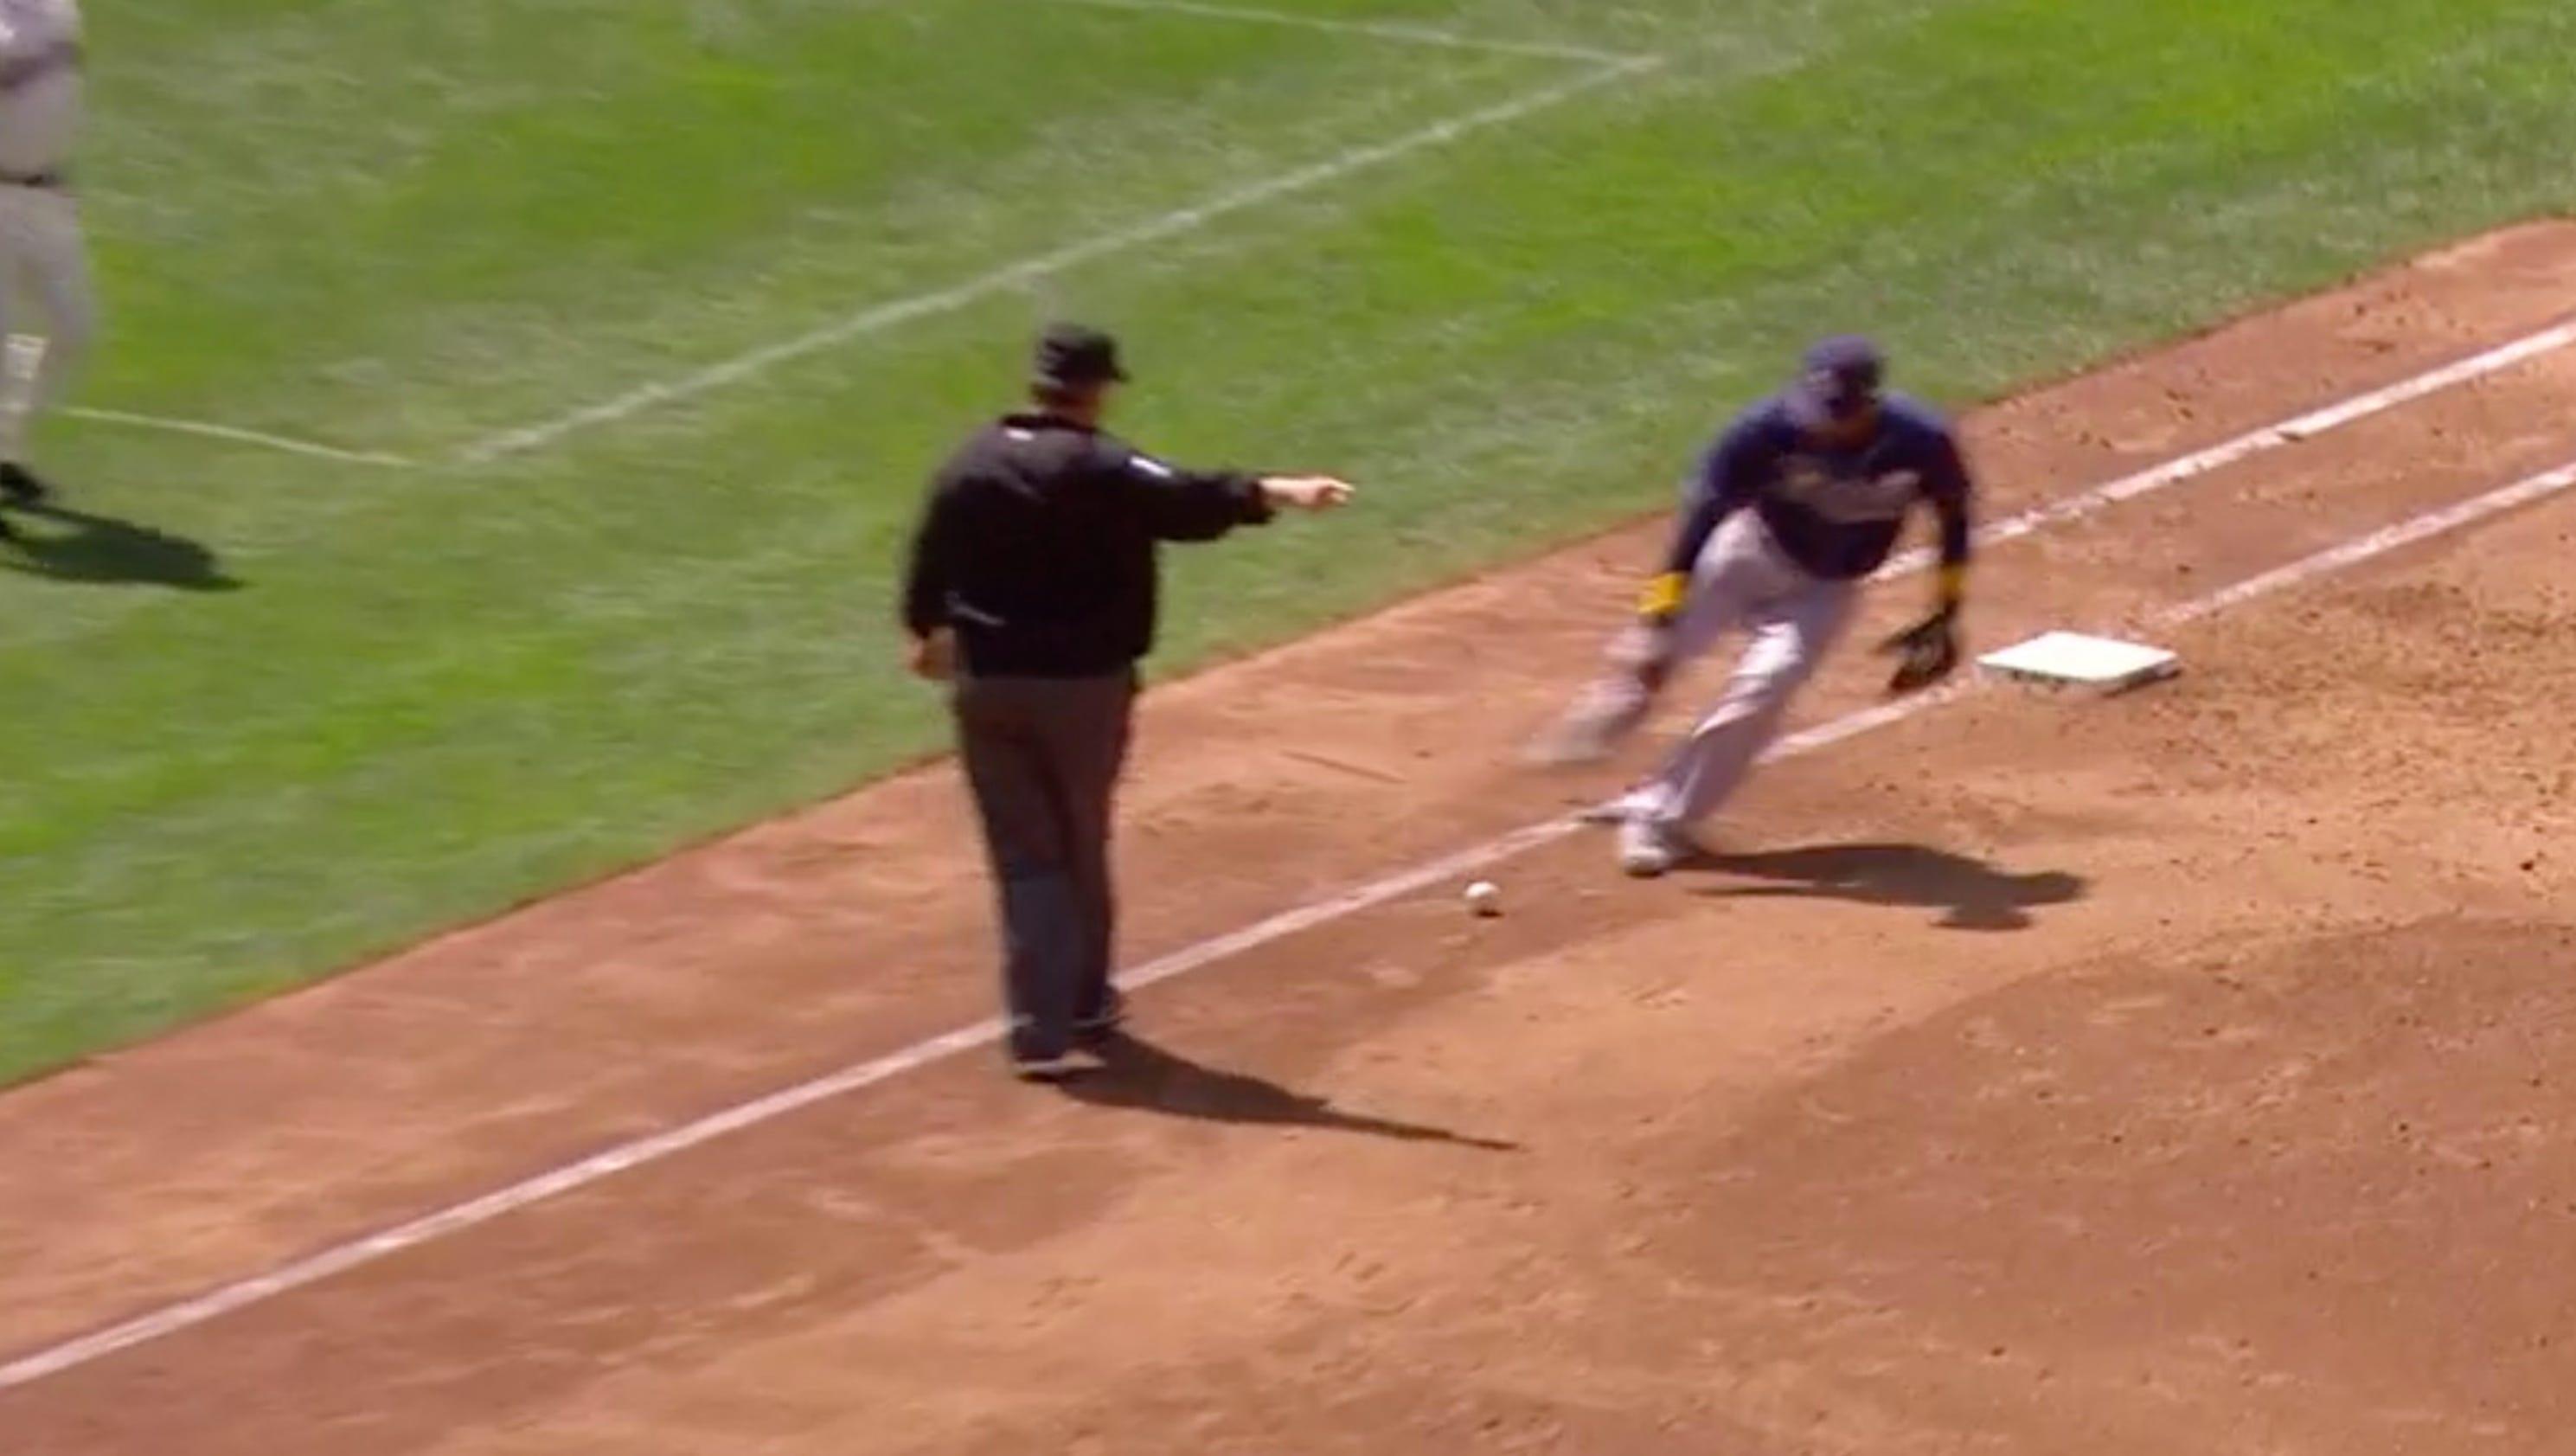 Softball C Screen : Robinson cano got unluckiest deflection off ump